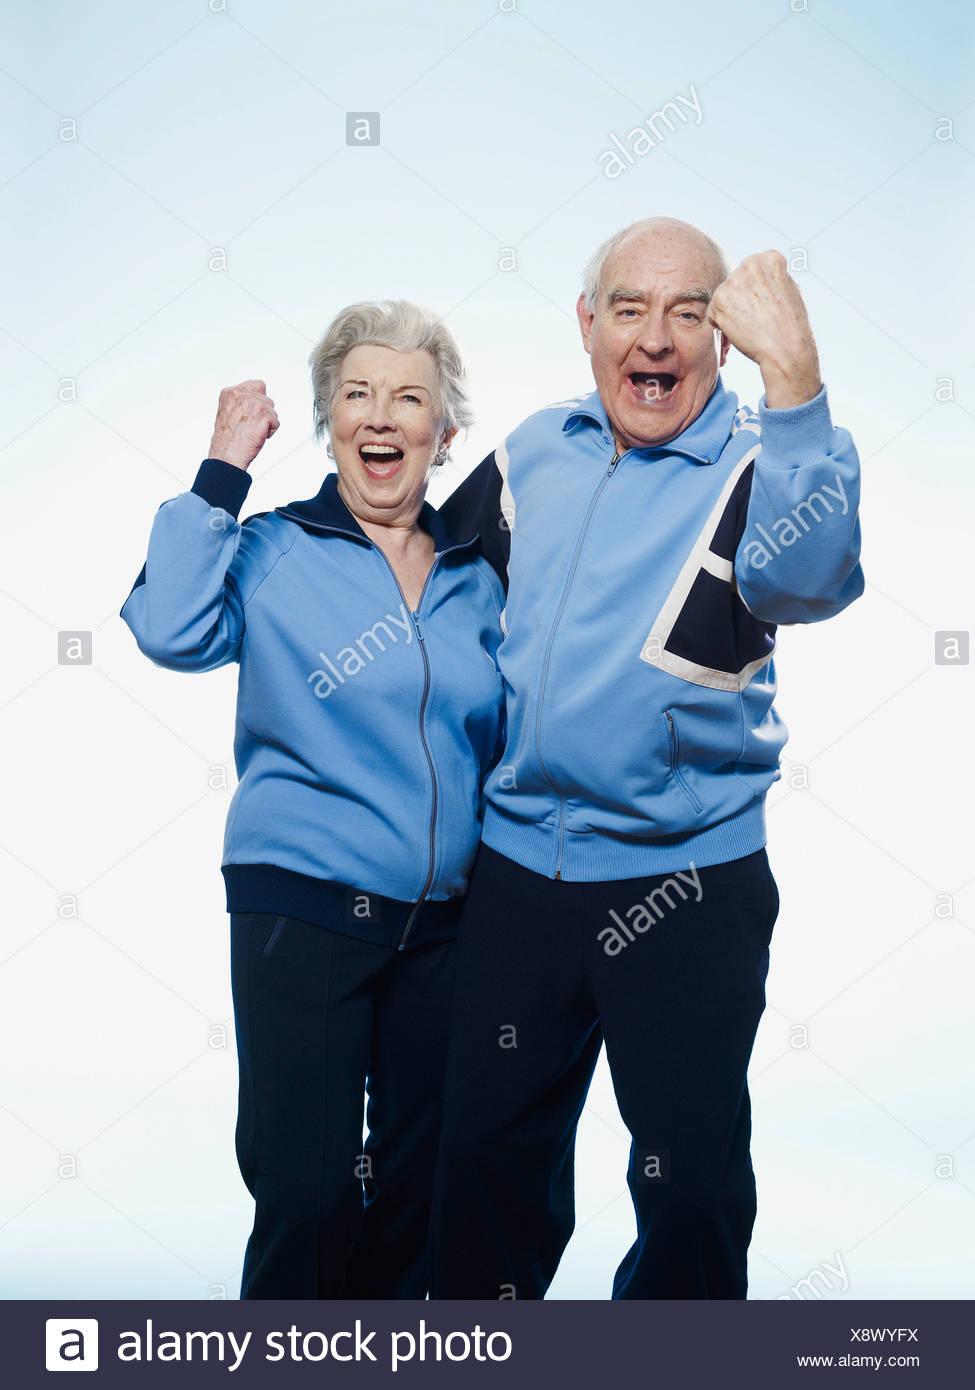 Senior man and woman in sportswear cheering - Stock Image